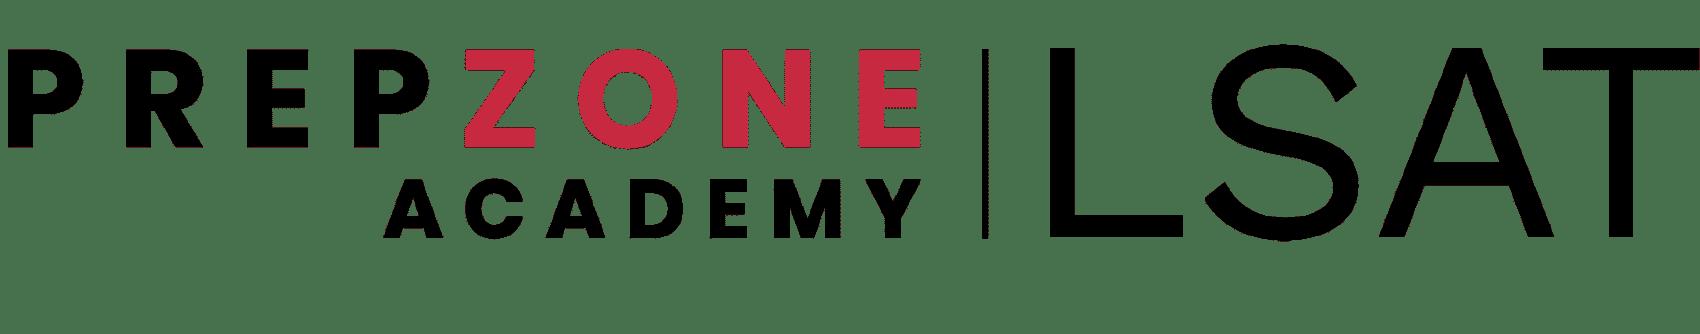 Prep Zone Academy   LSAT